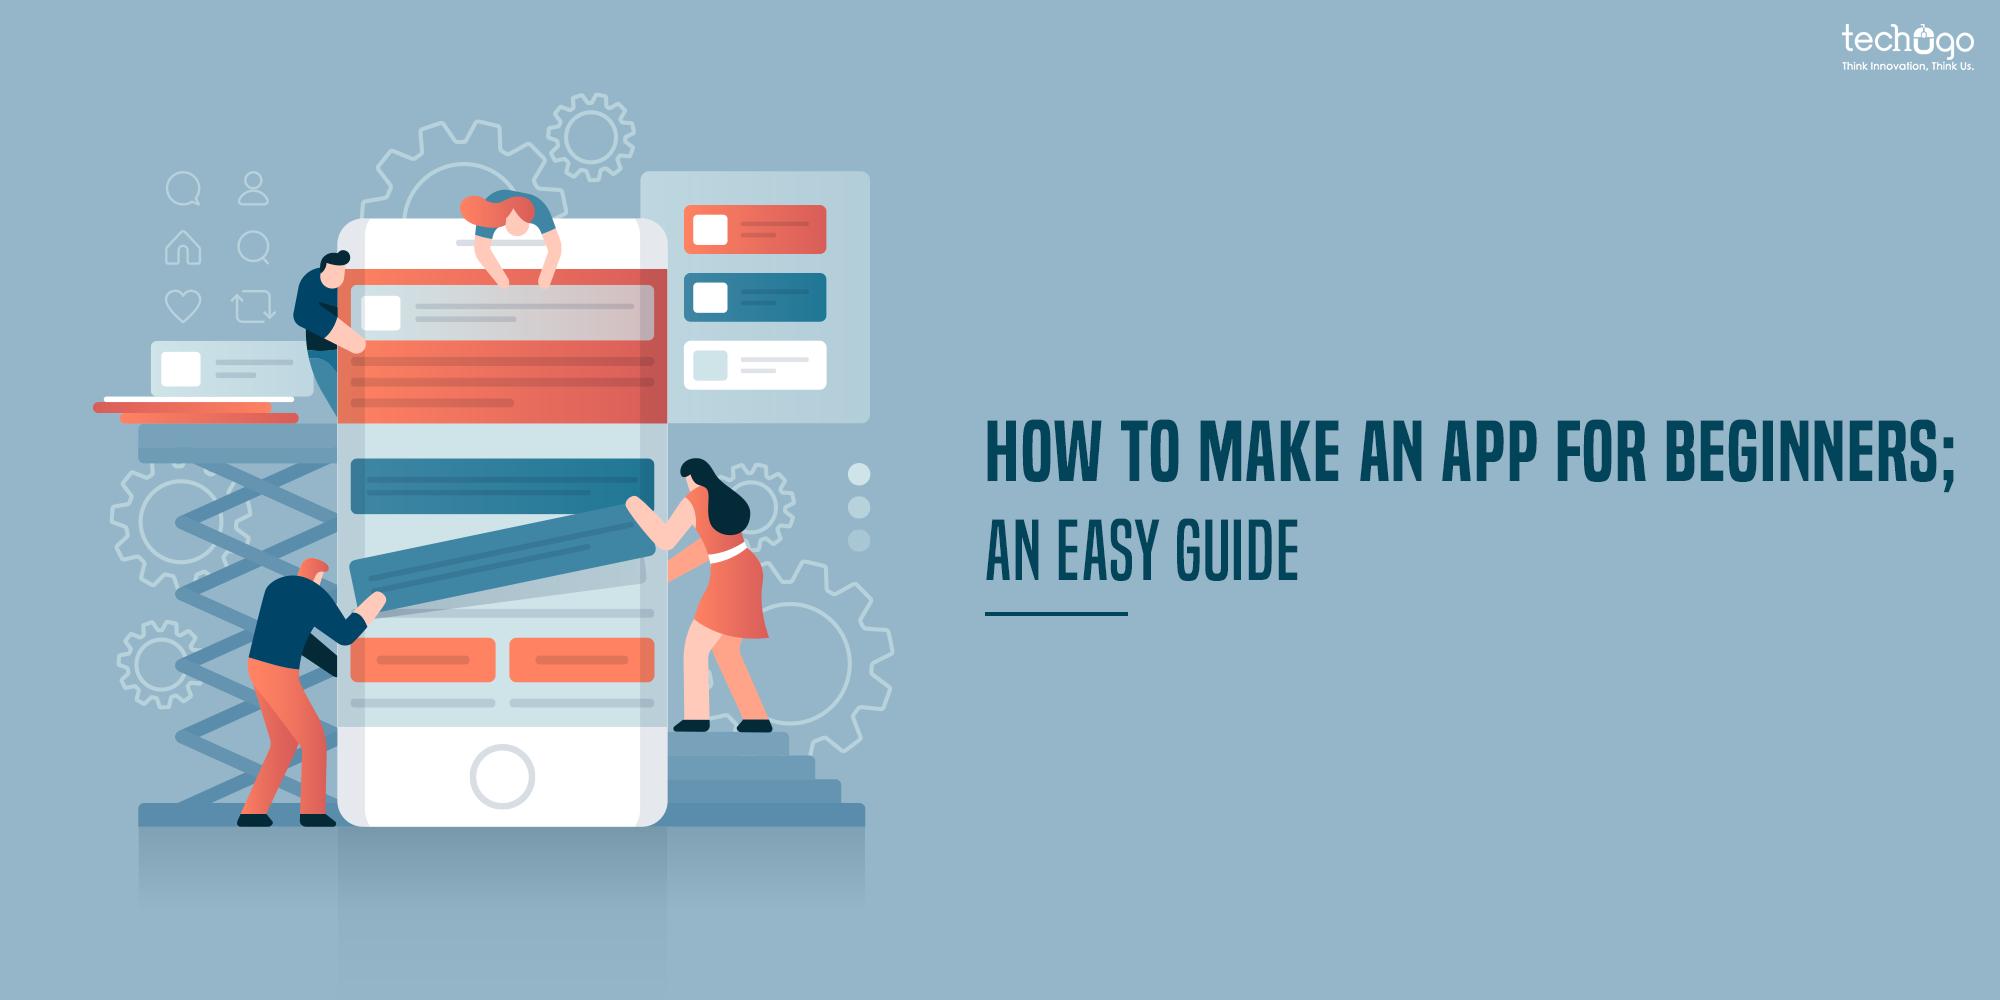 Make An App For Beginners